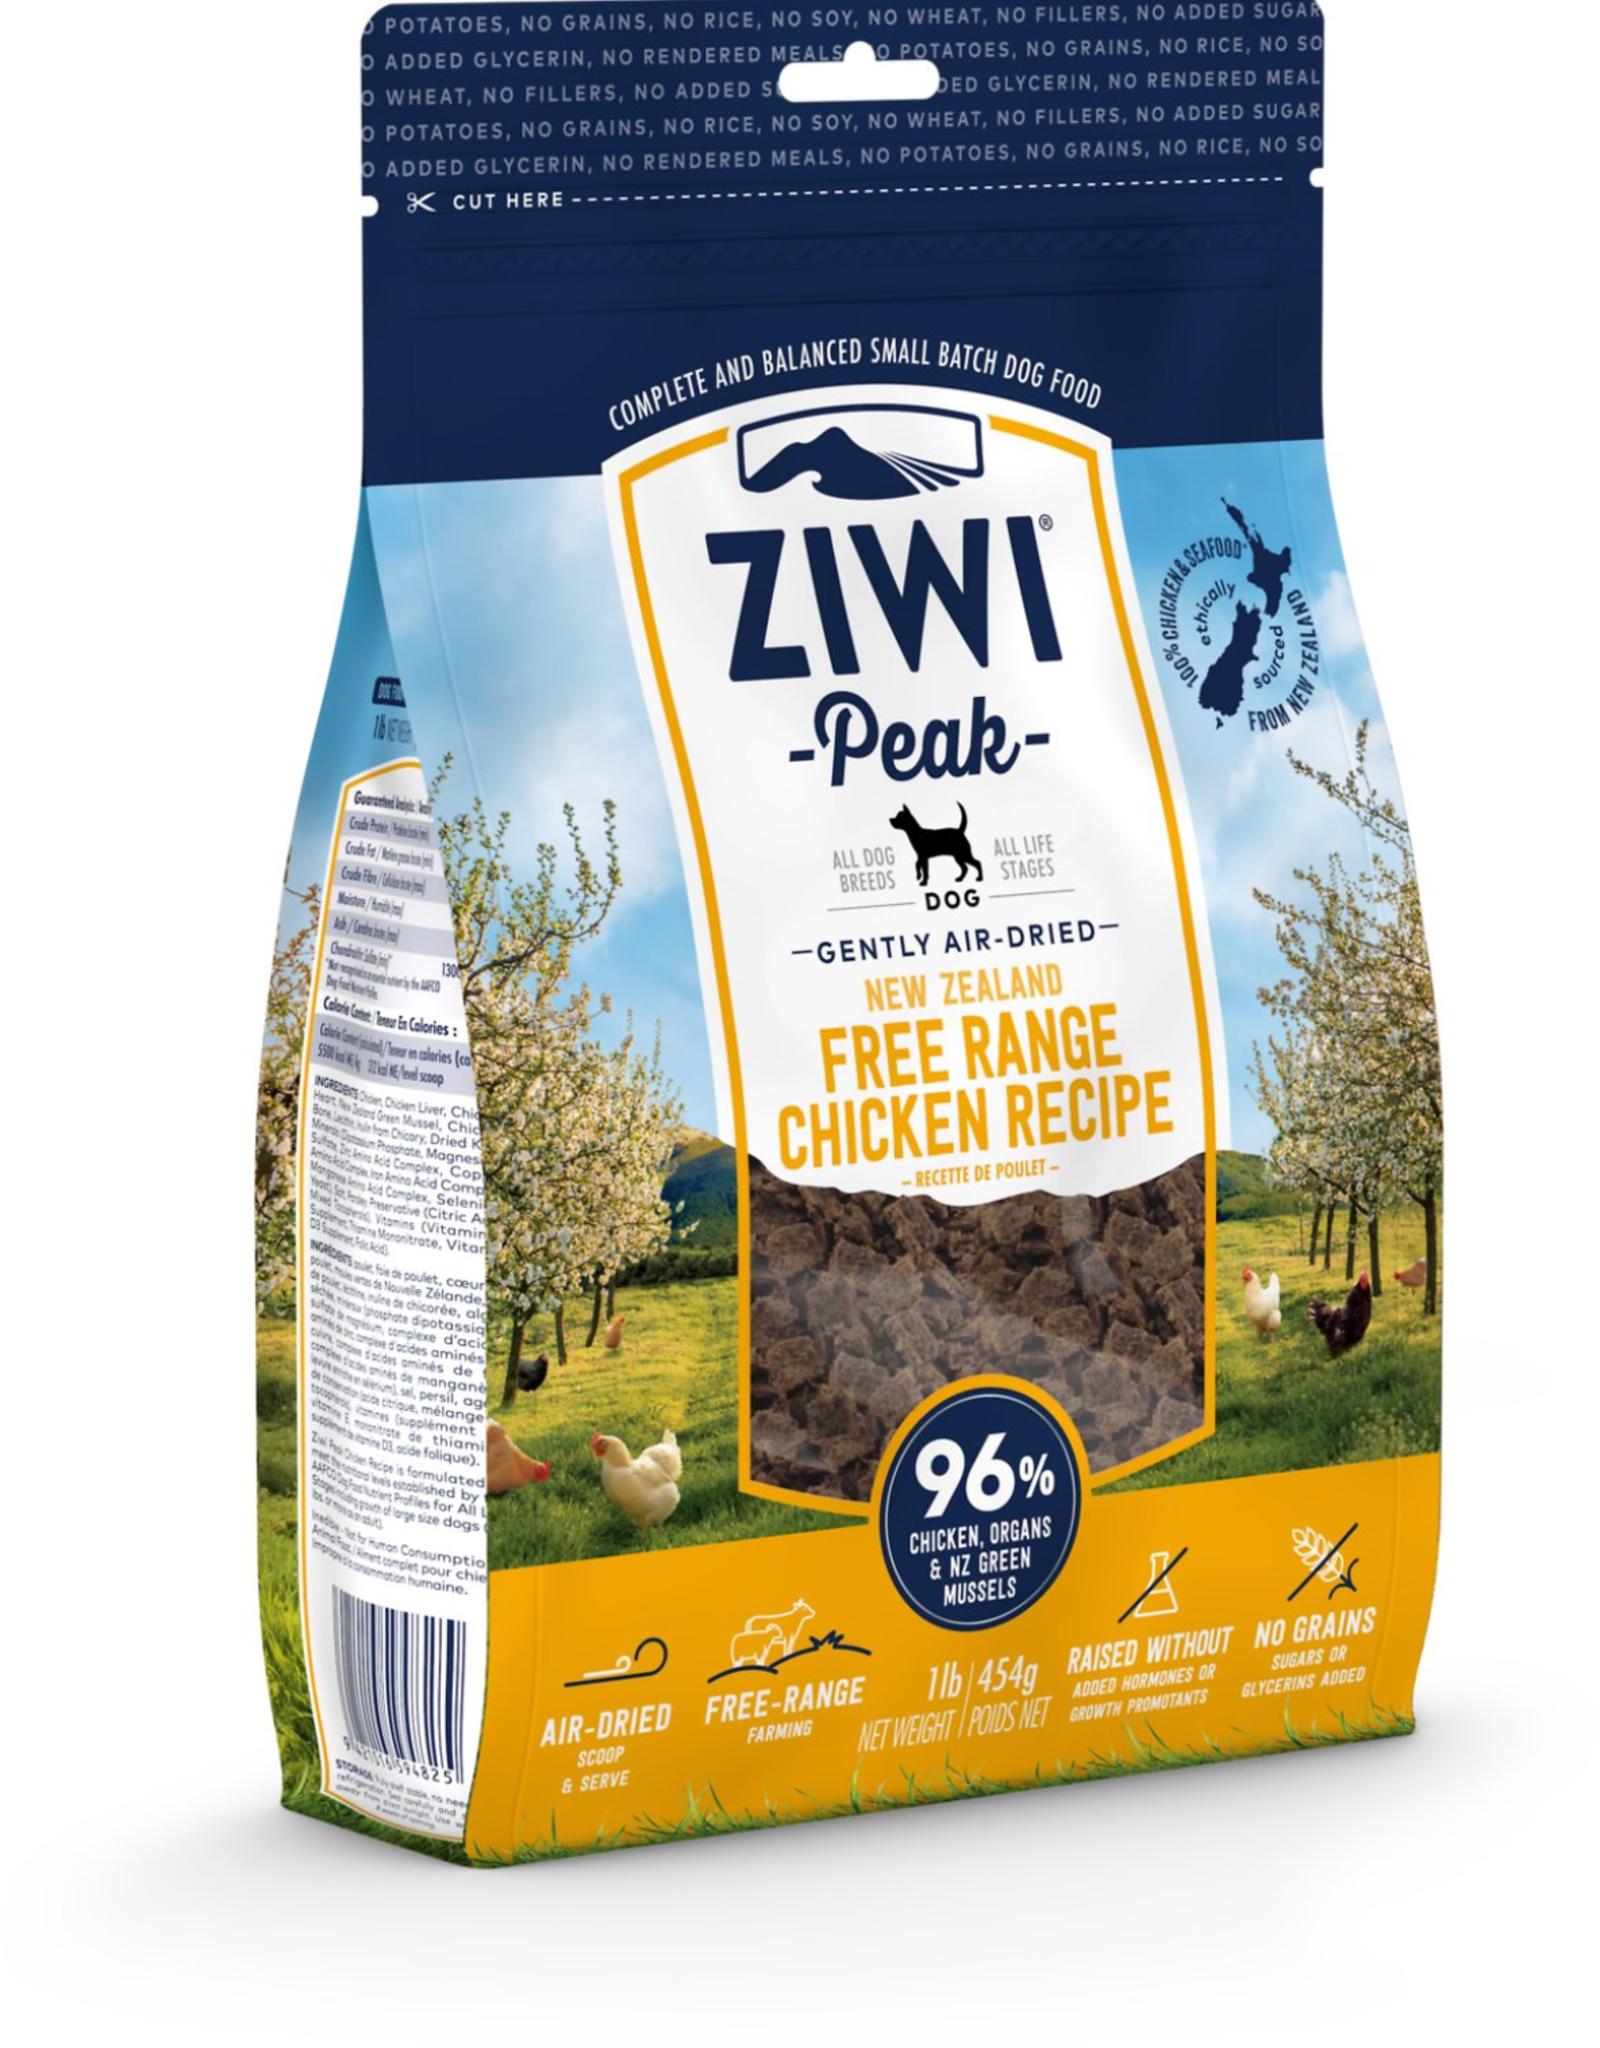 Ziwi Ziwi Peak - Dog Food - Chicken Flavored - 16oz